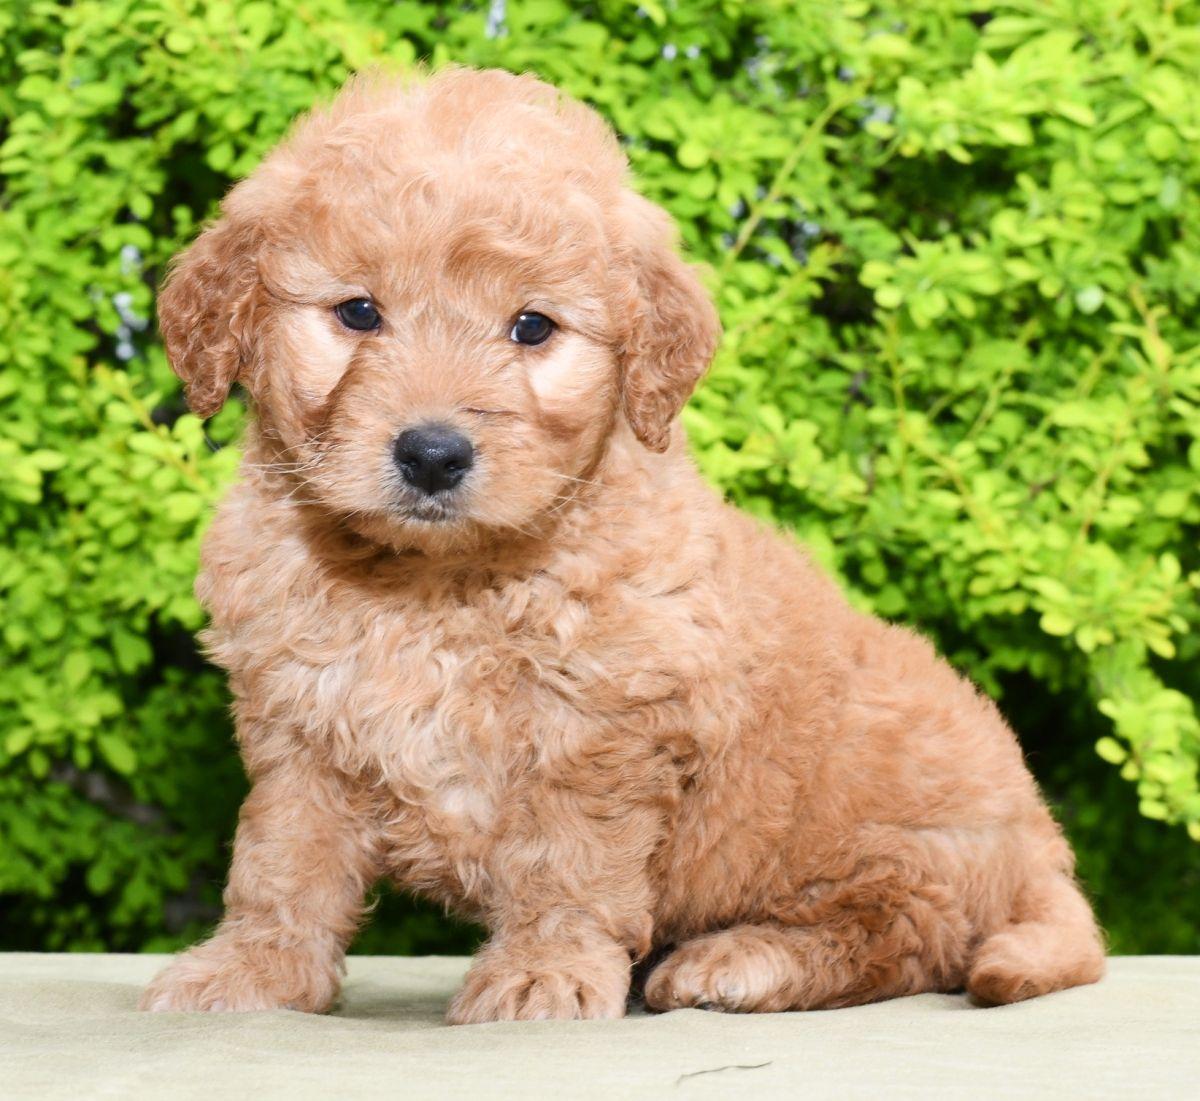 Lovable MiniGoldendoodle Mini goldendoodle puppies